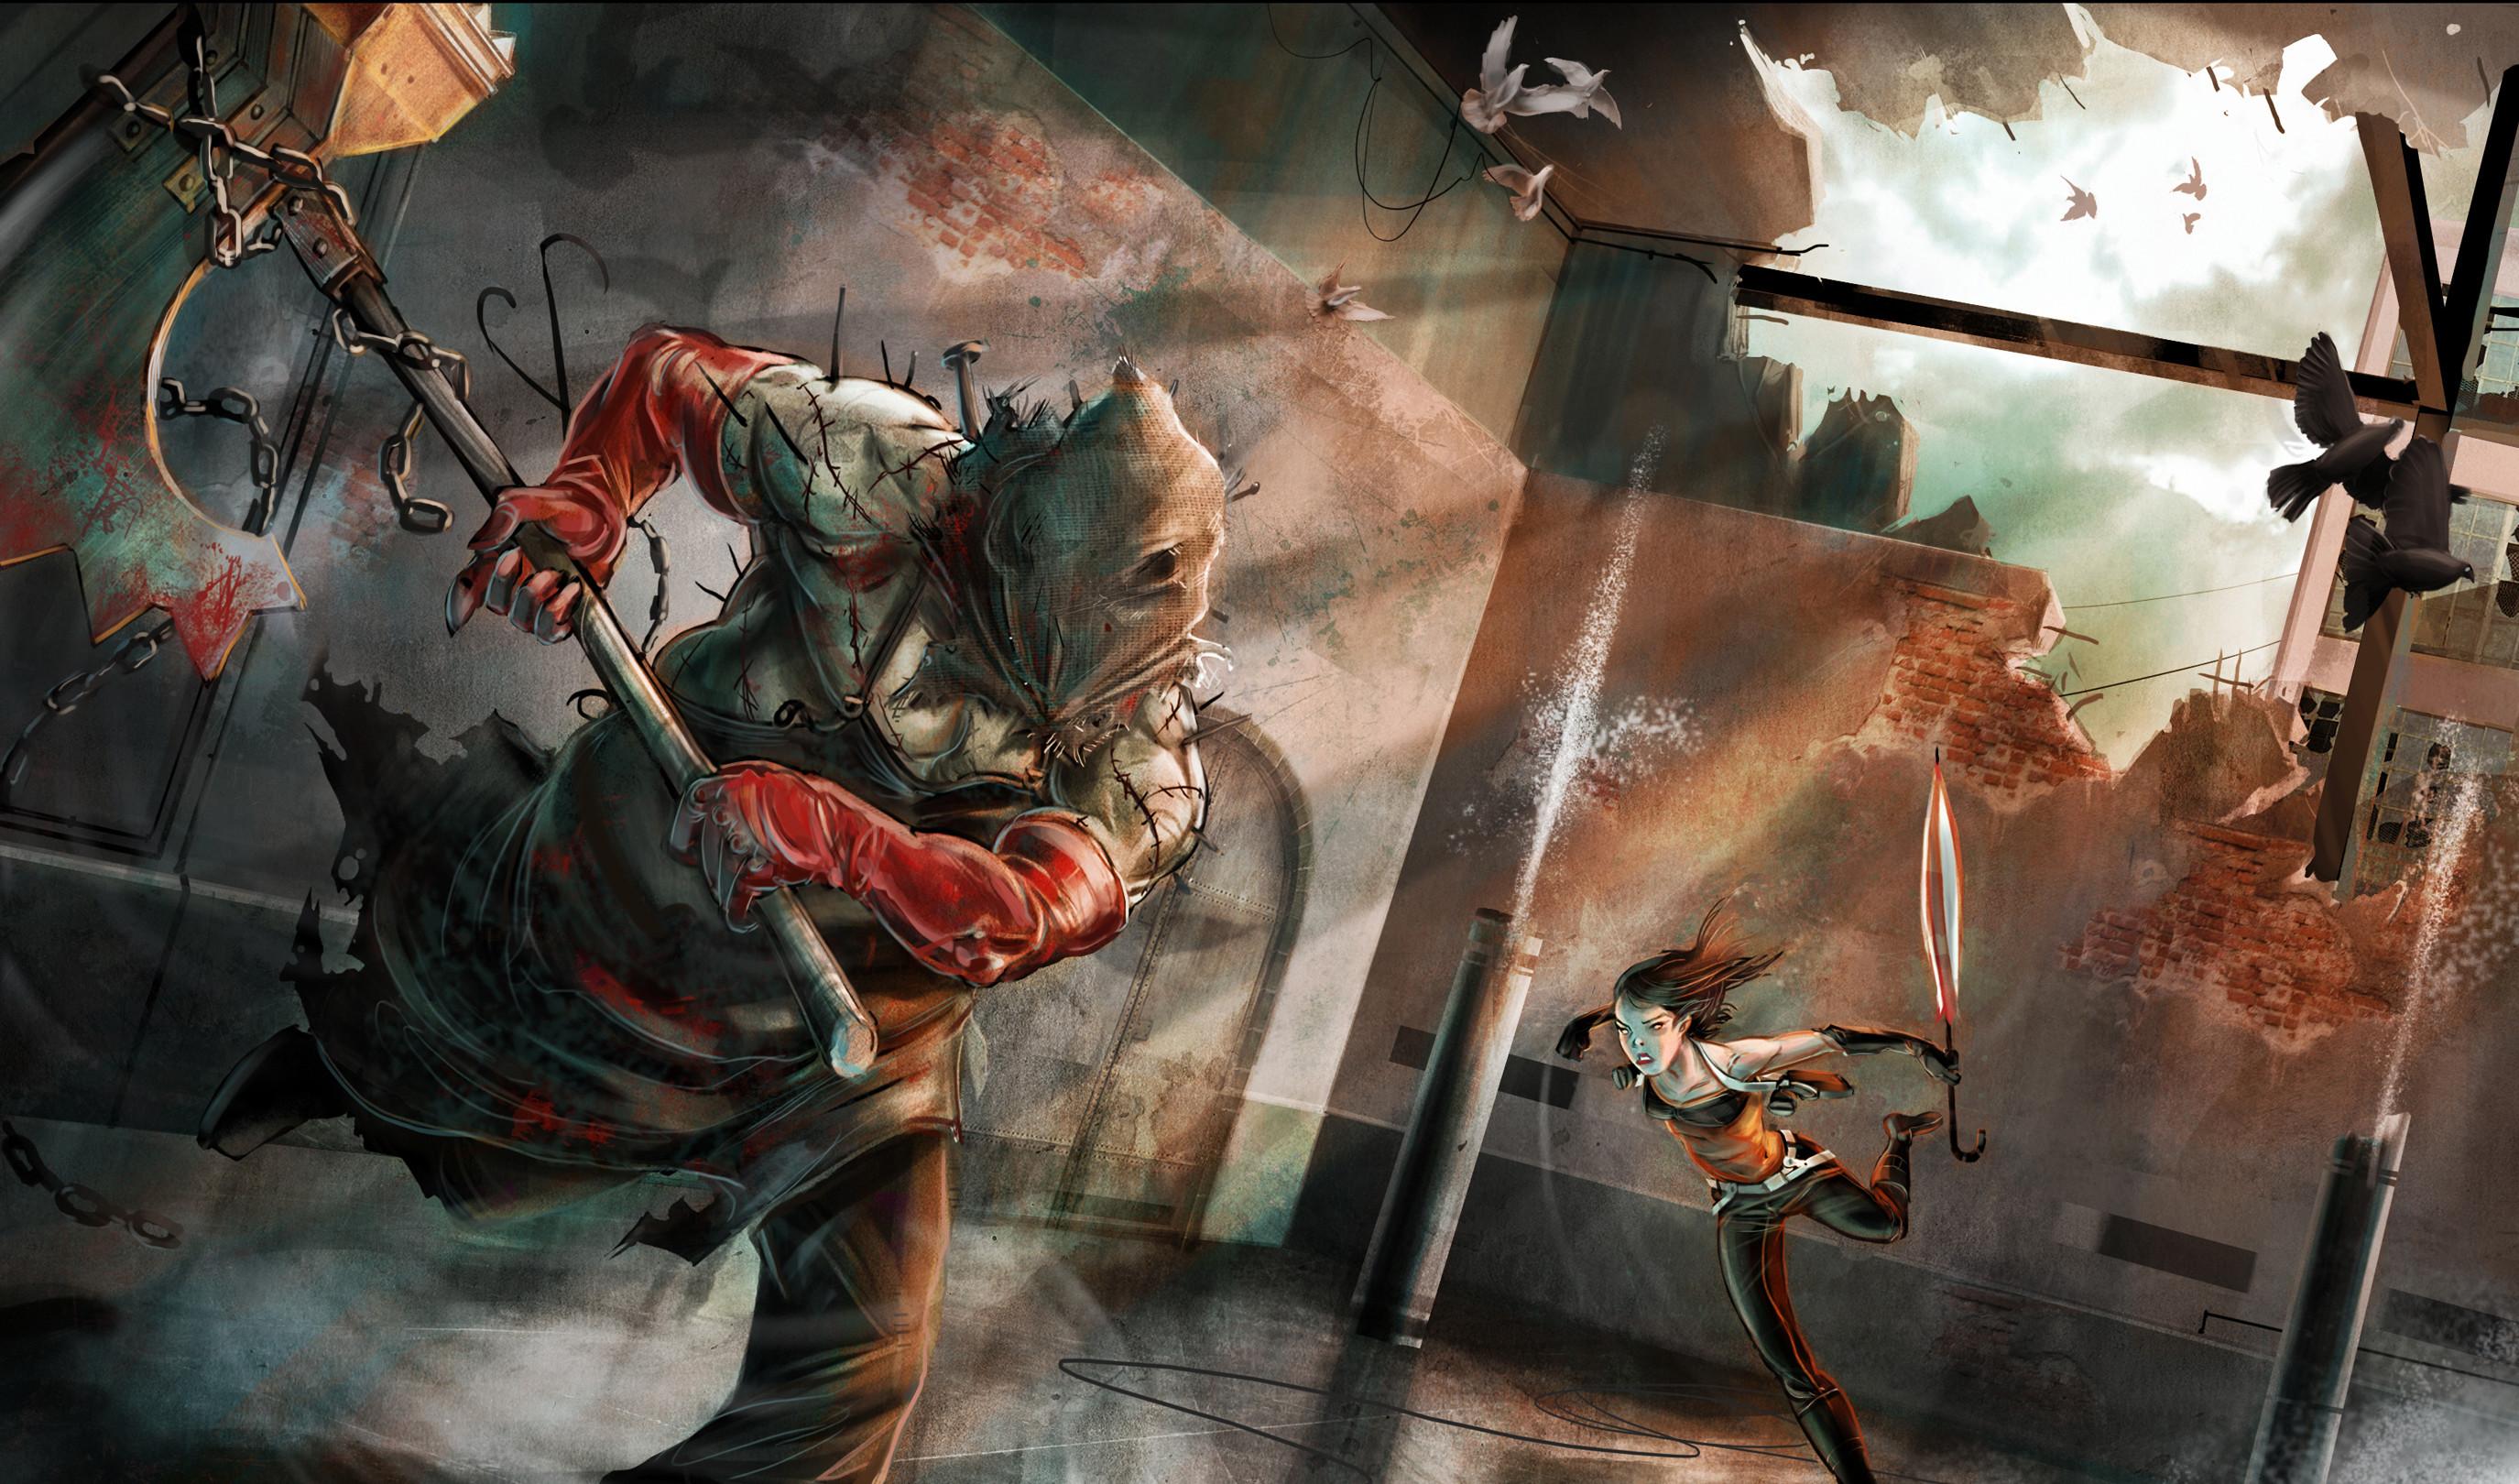 Resident Evil Computer Wallpapers, Desktop Backgrounds .